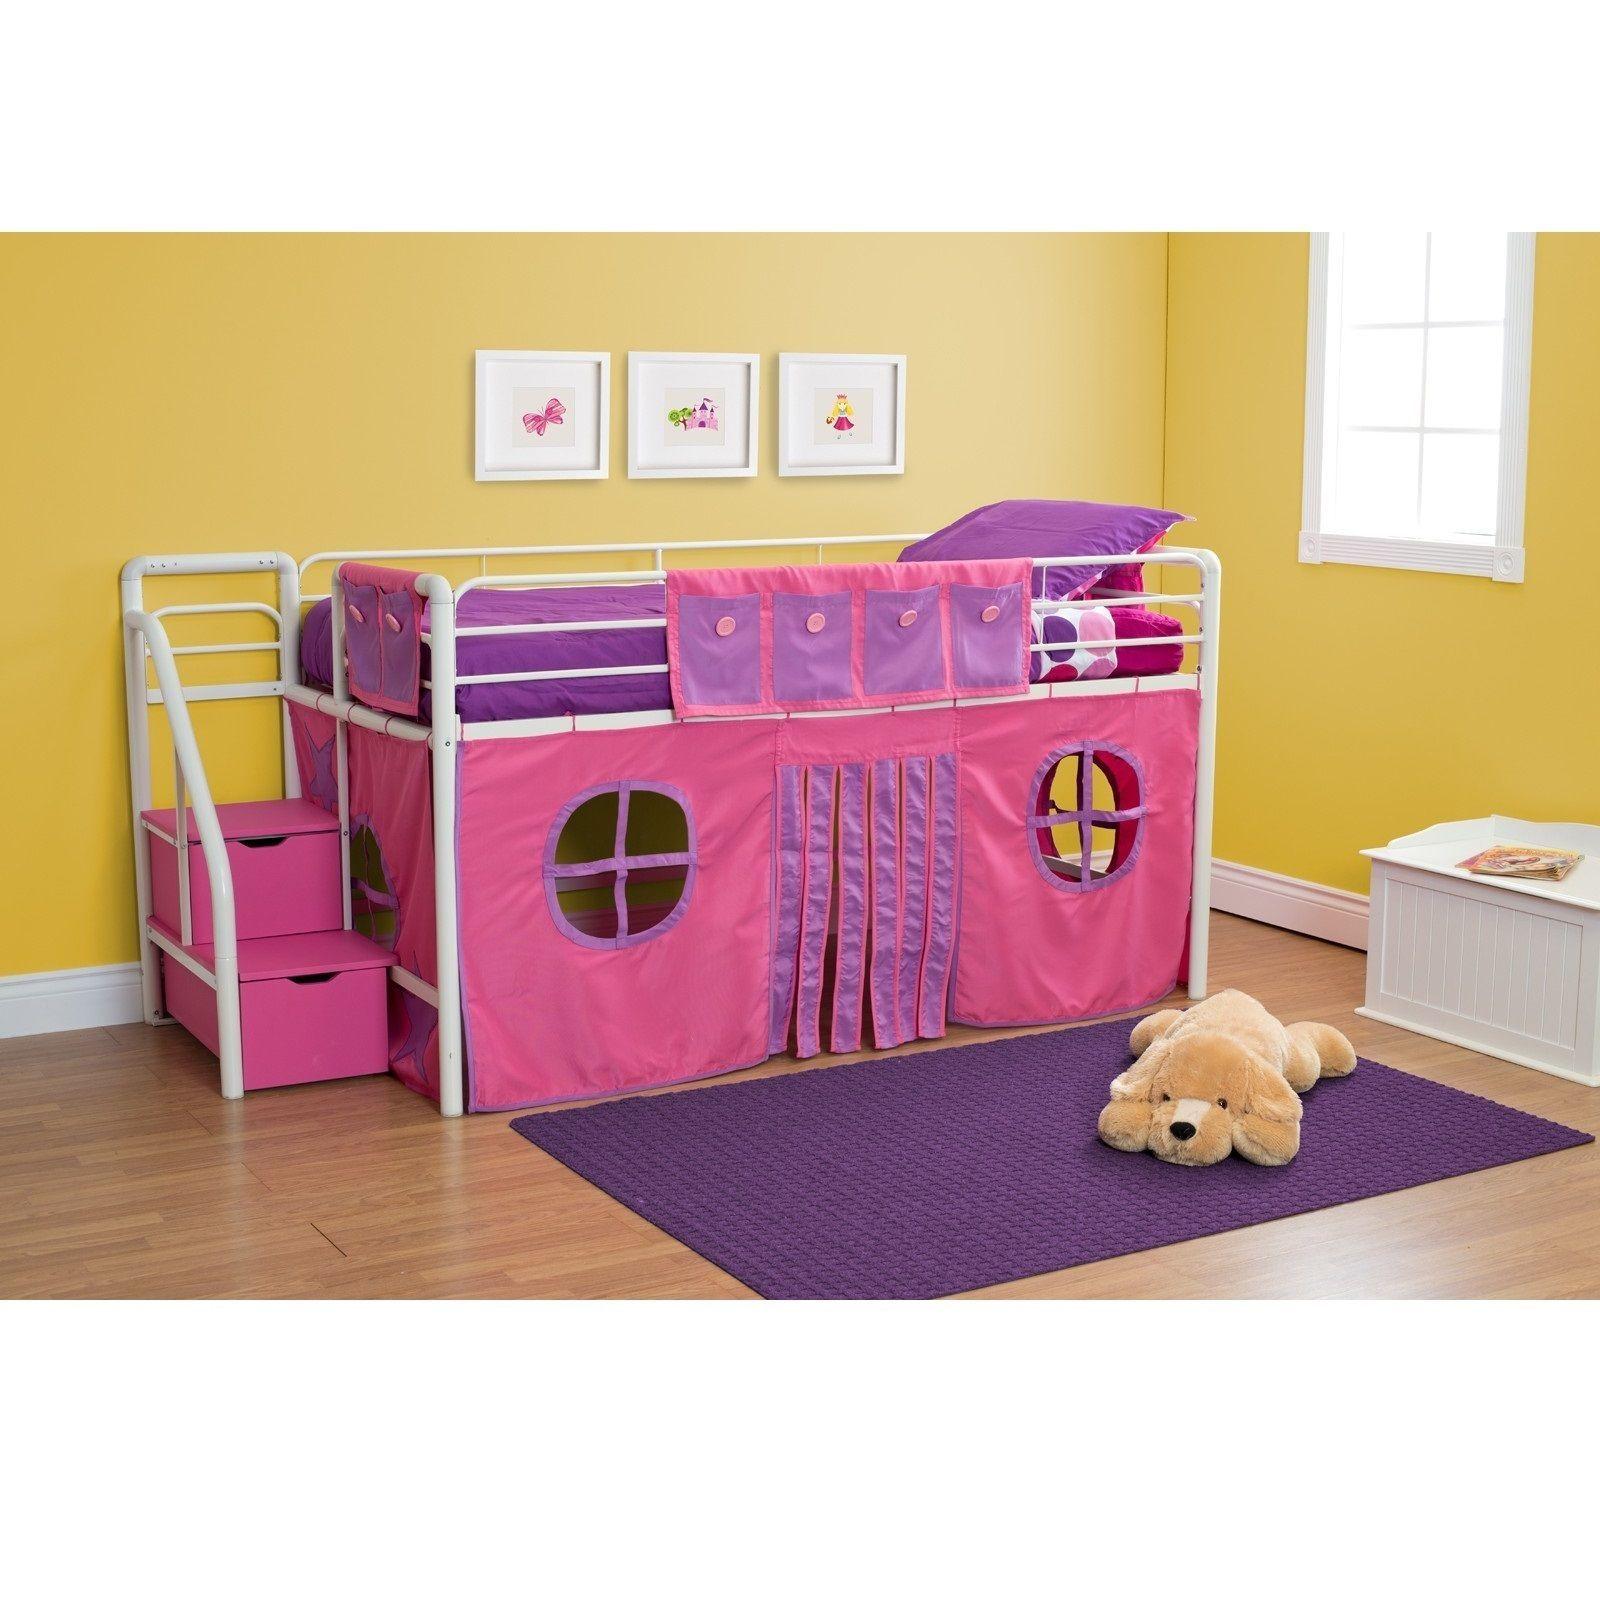 Avenue Greene Curtain Set for Loft Bed Kids loft beds